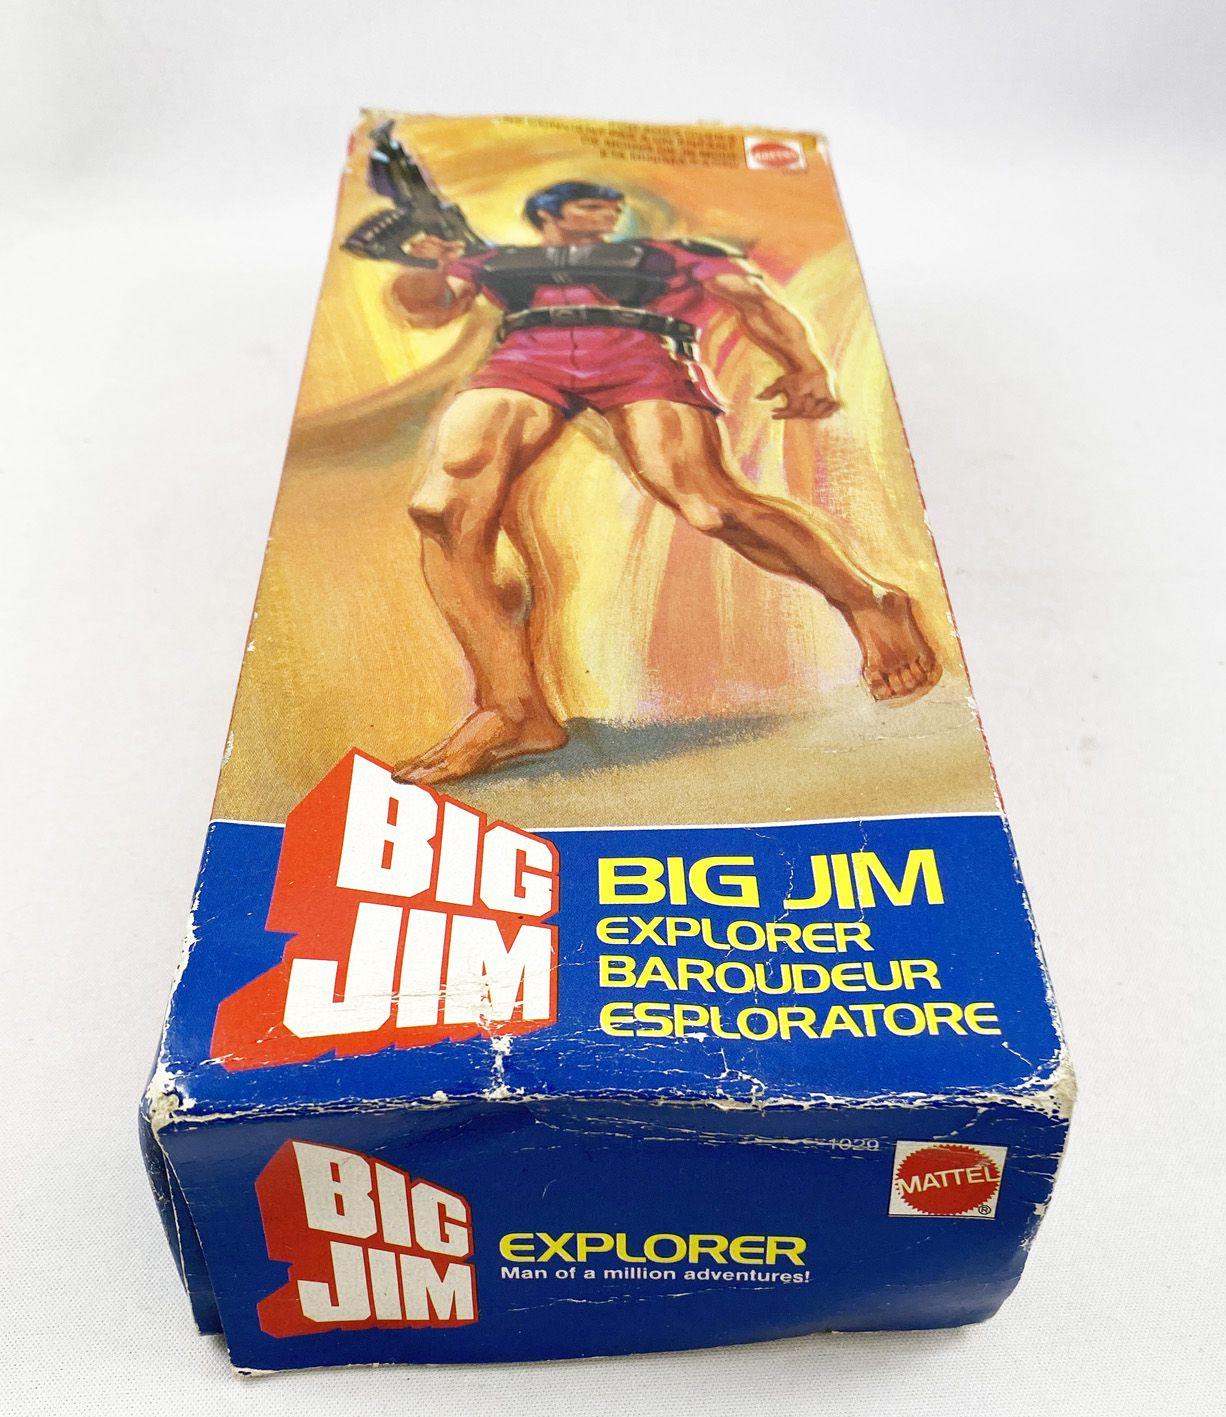 Big Jim Série Commando - Mattel - Big Jim Baroudeur (ref.1029) occasion en boite